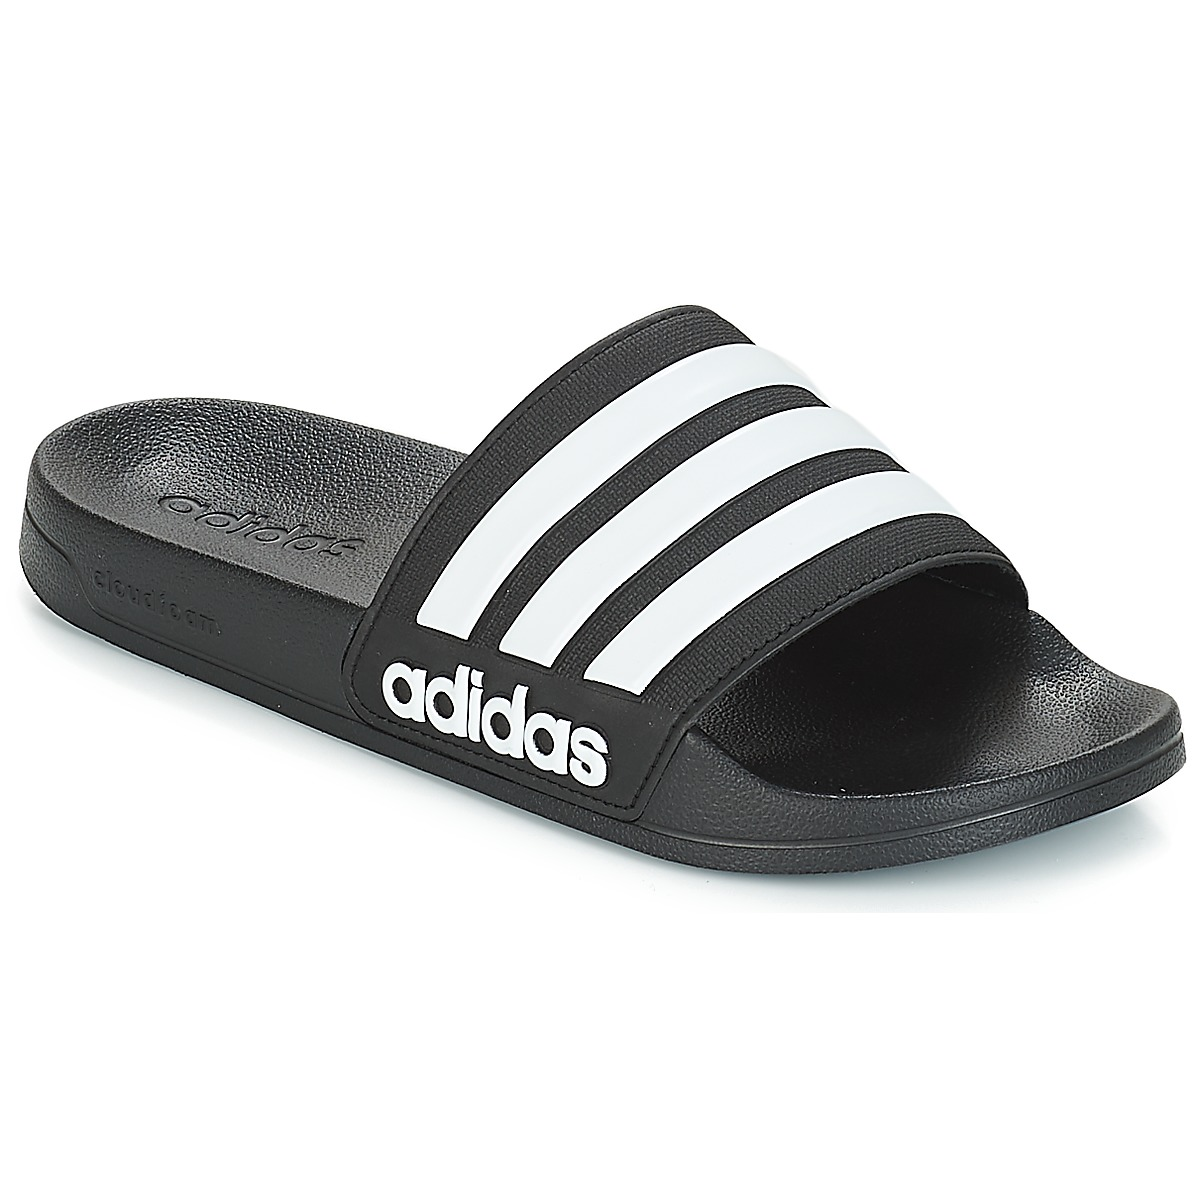 31437e741e89 adidas športové šľapky ADILETTE SHOWER adidas. adidas športové šľapky  ADILETTE SHOWER adidas. adidas športové šľapky ADILETTE ...